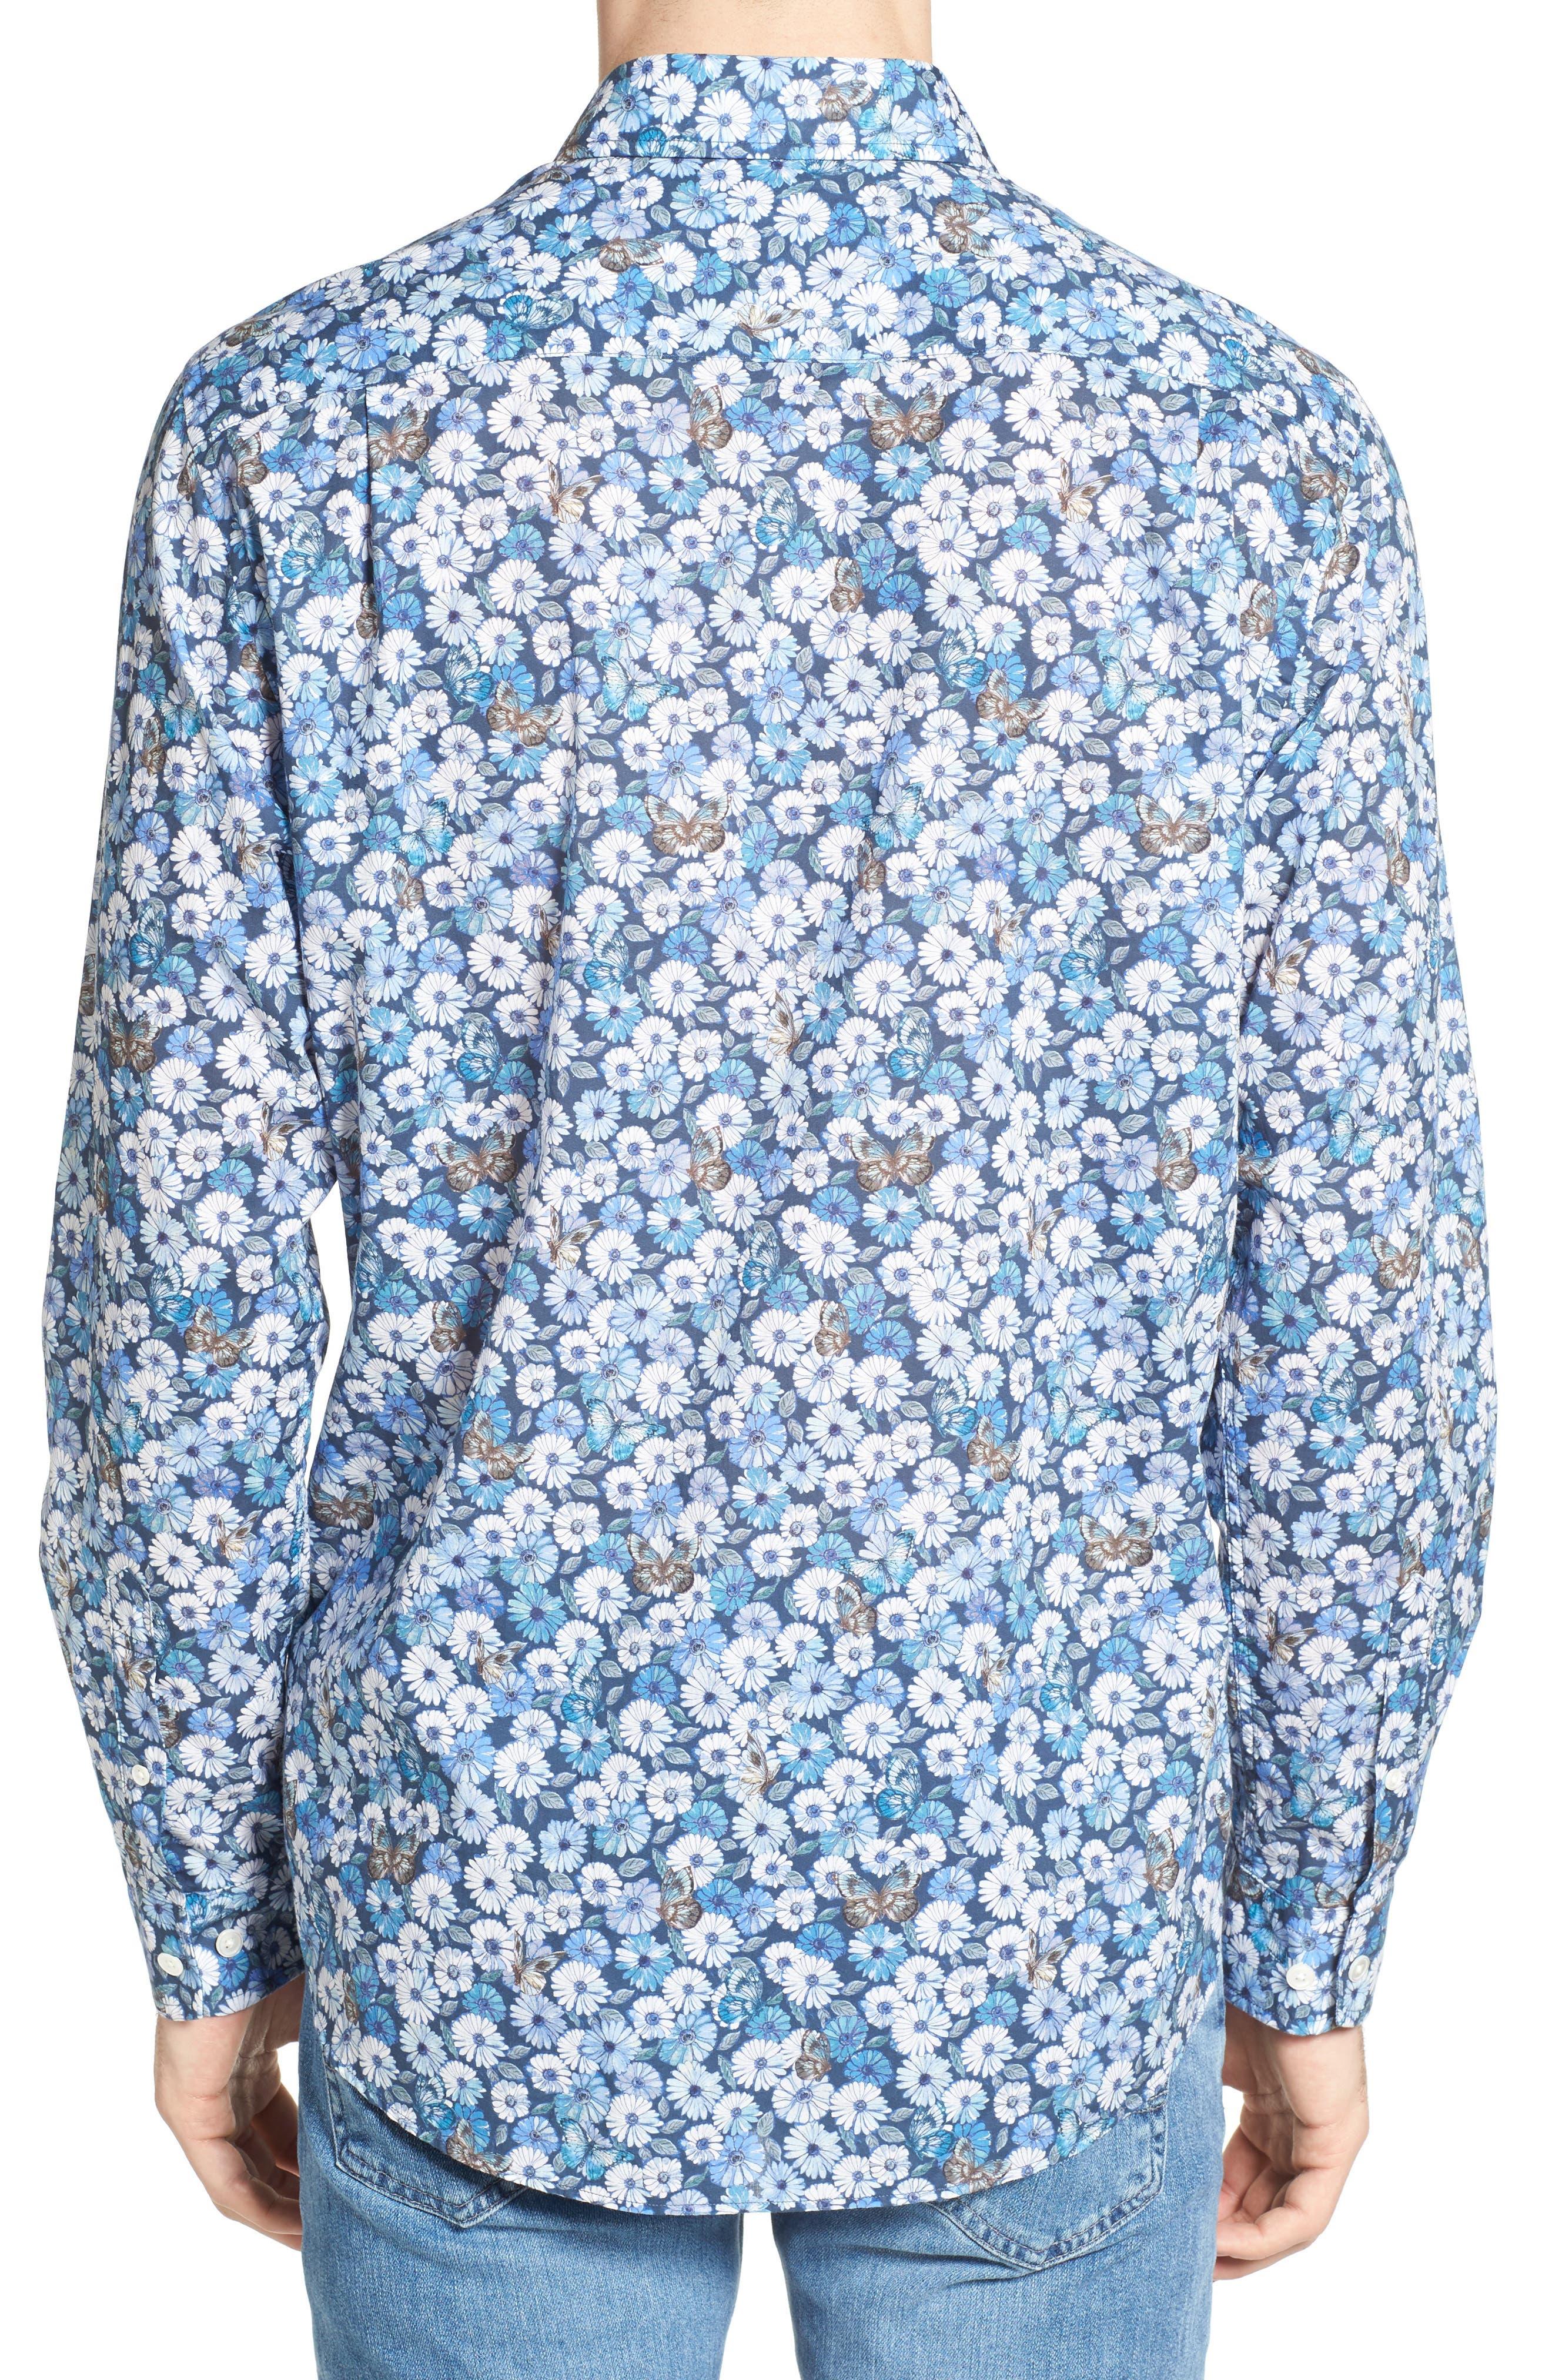 Leith Sport Shirt,                             Alternate thumbnail 2, color,                             414